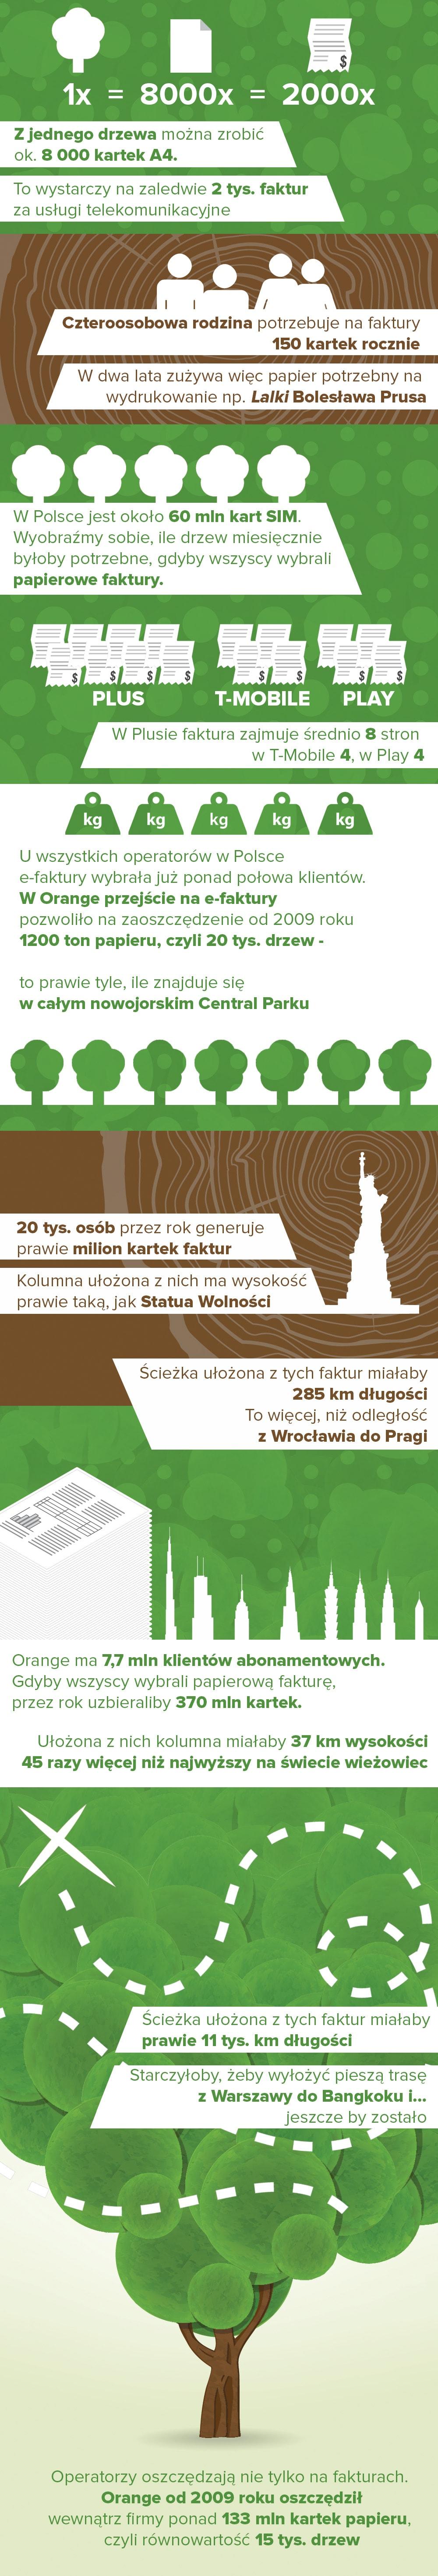 efaktury-w-polsce-infografika-spidersweb-min